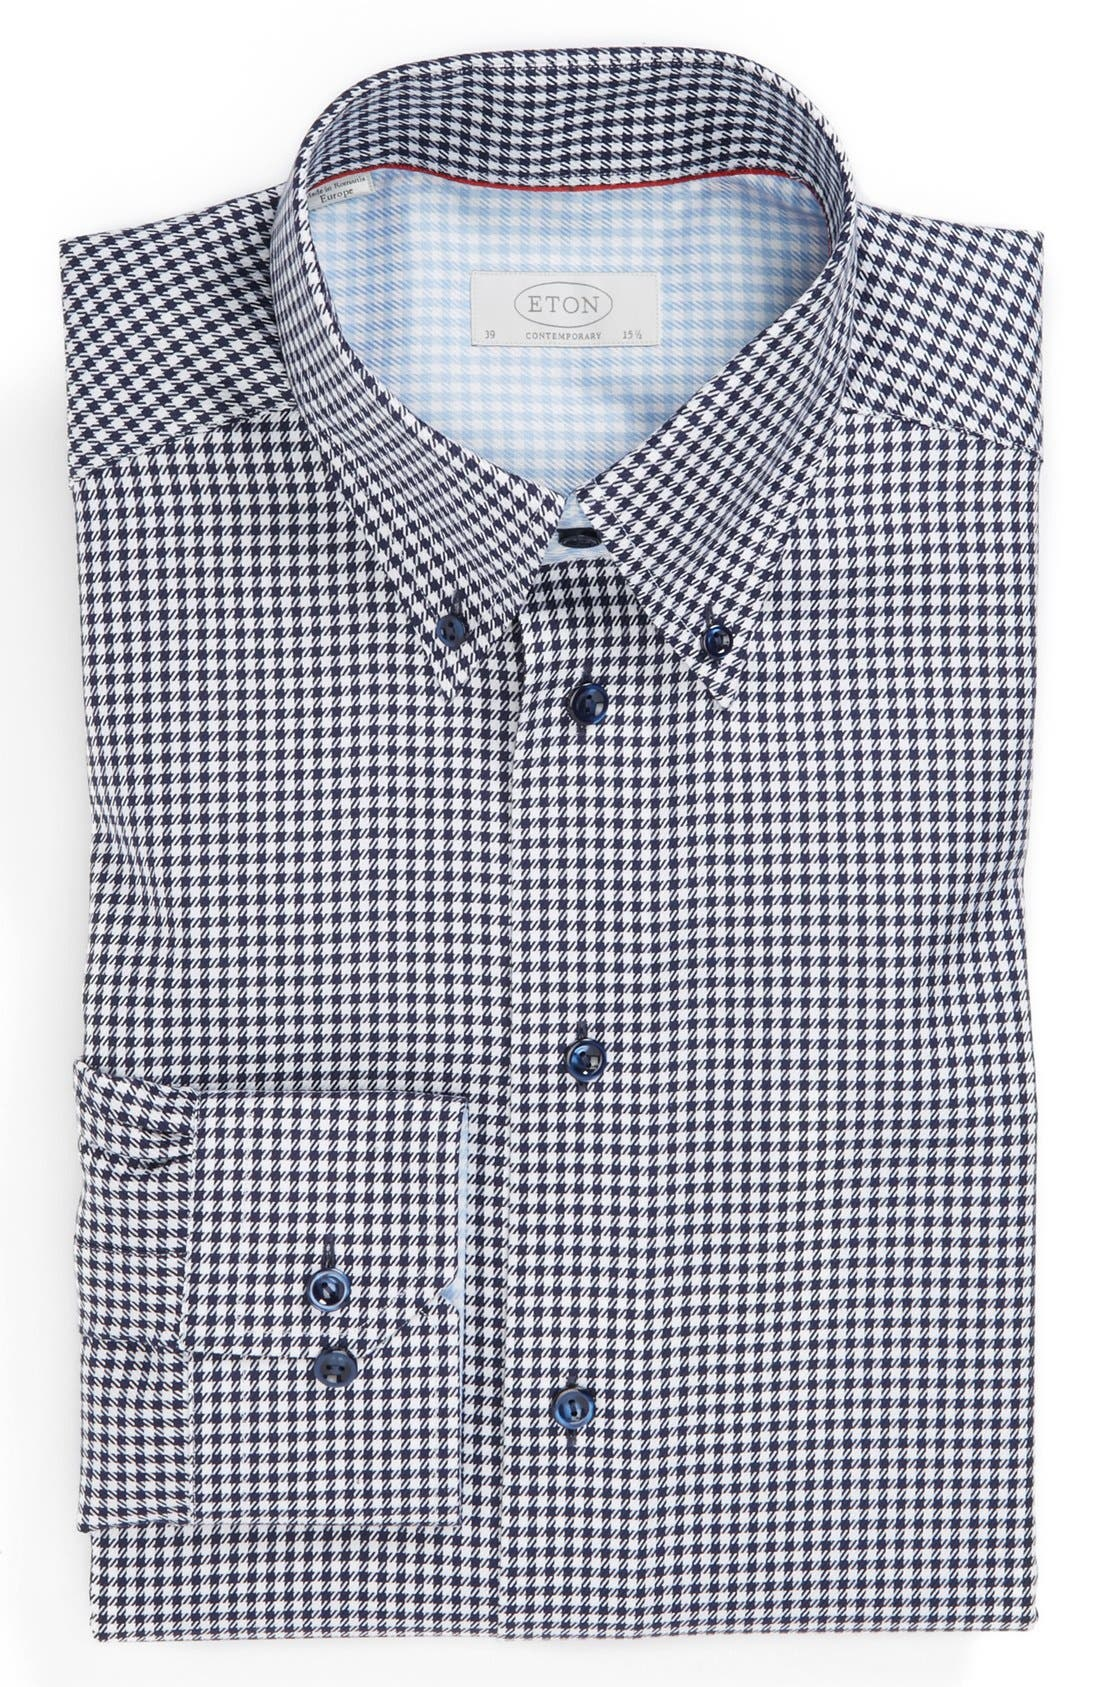 Alternate Image 1 Selected - Eton Contemporary Fit Non-Iron Dress Shirt